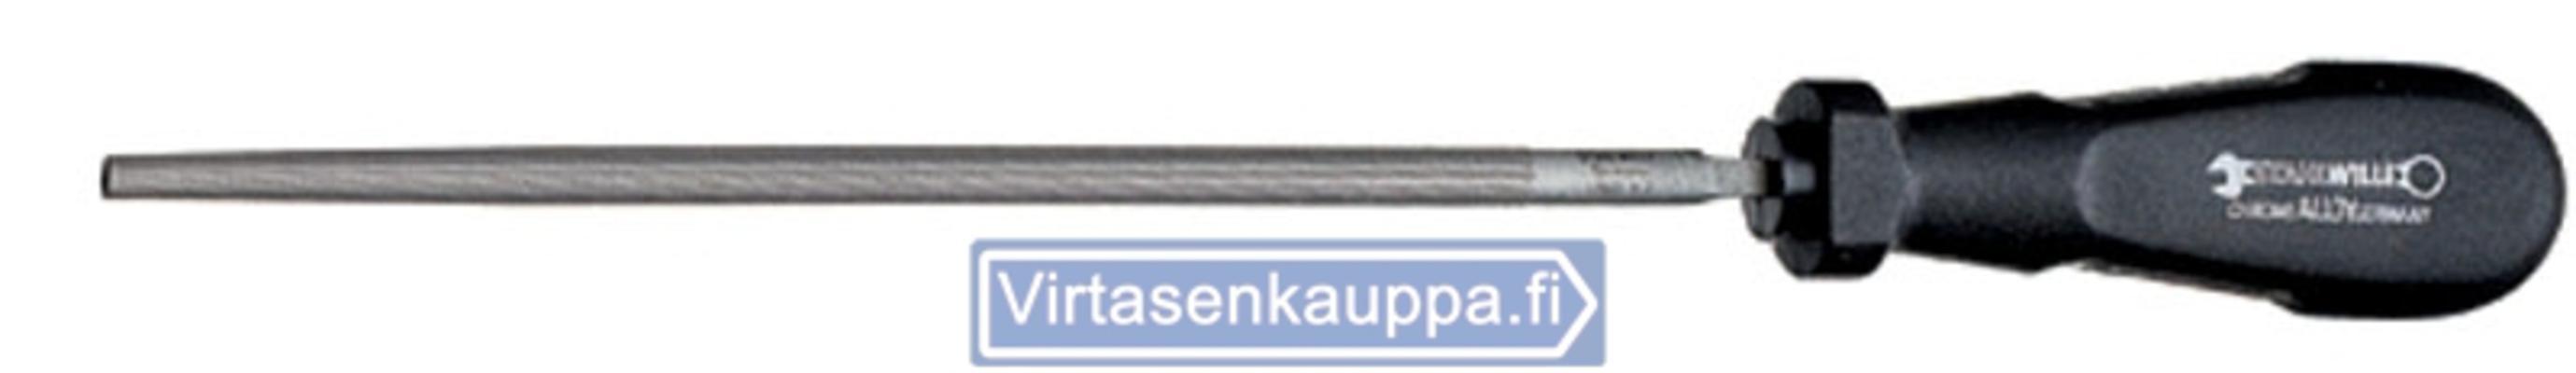 Pyöröviila 200 mm, Stahlwille - Pyöröviila 200 mm